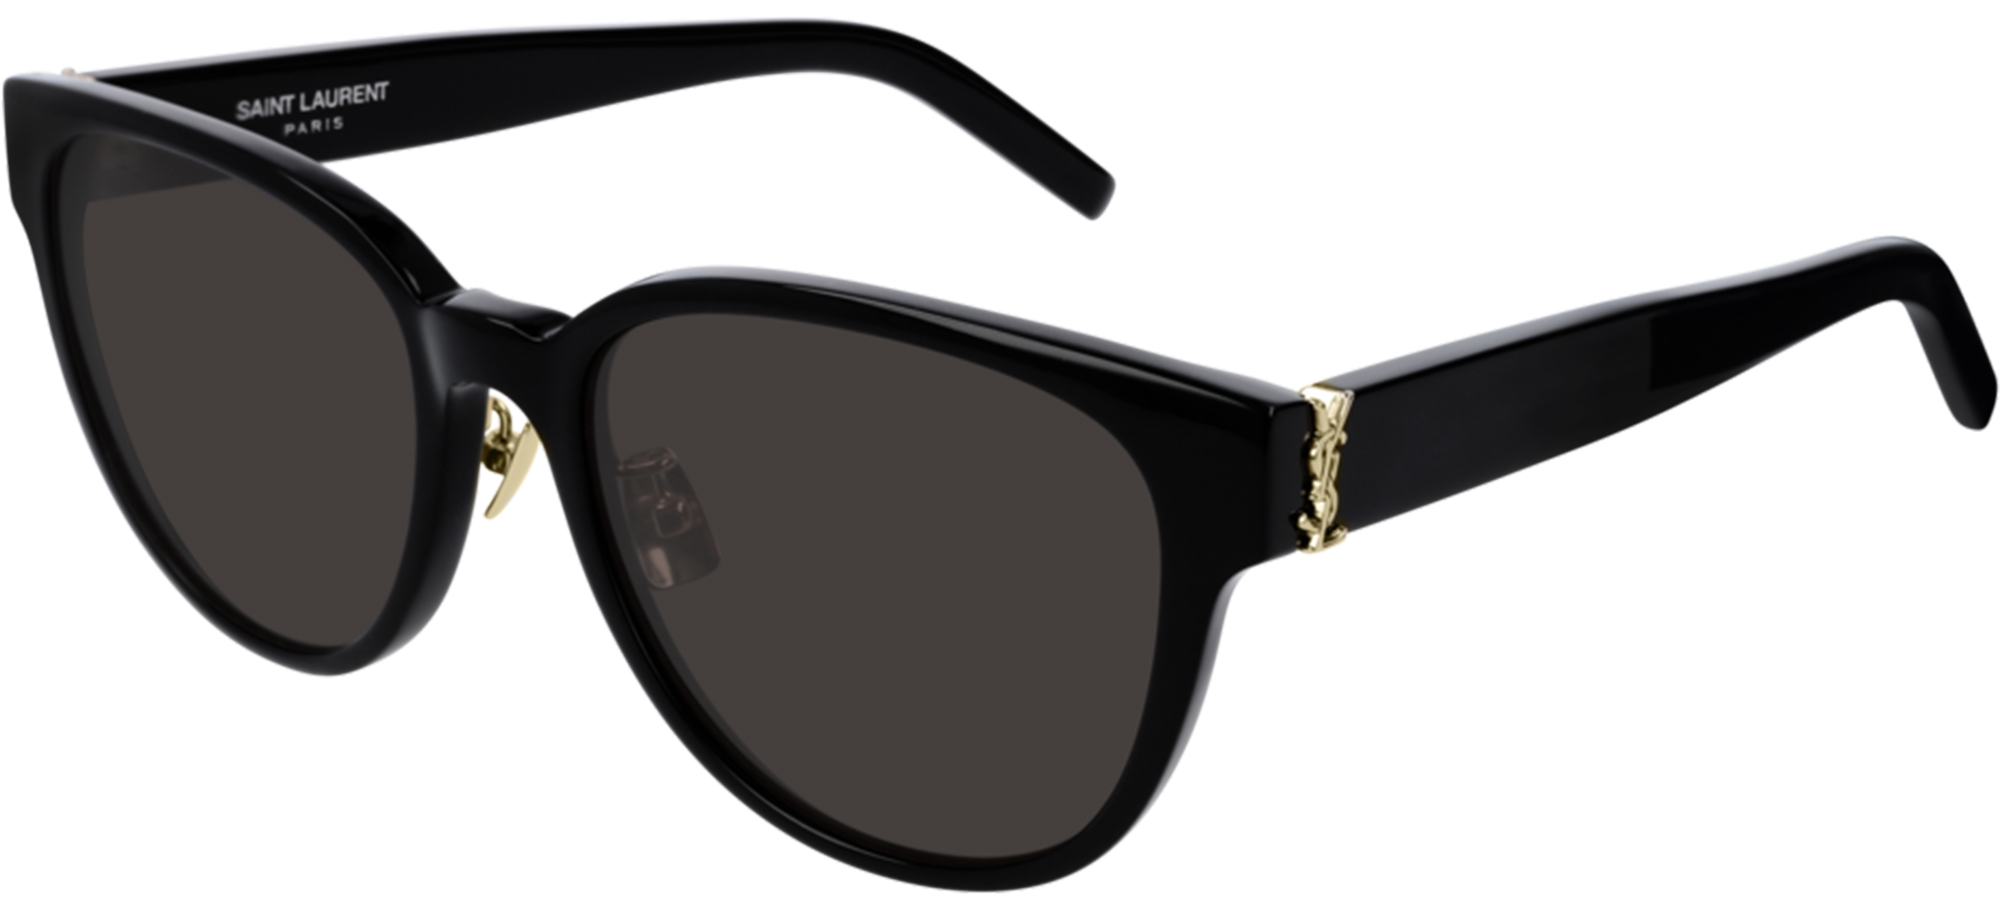 004 HAVANA//BROWN Sunglasses Saint Laurent SL M 38 //K